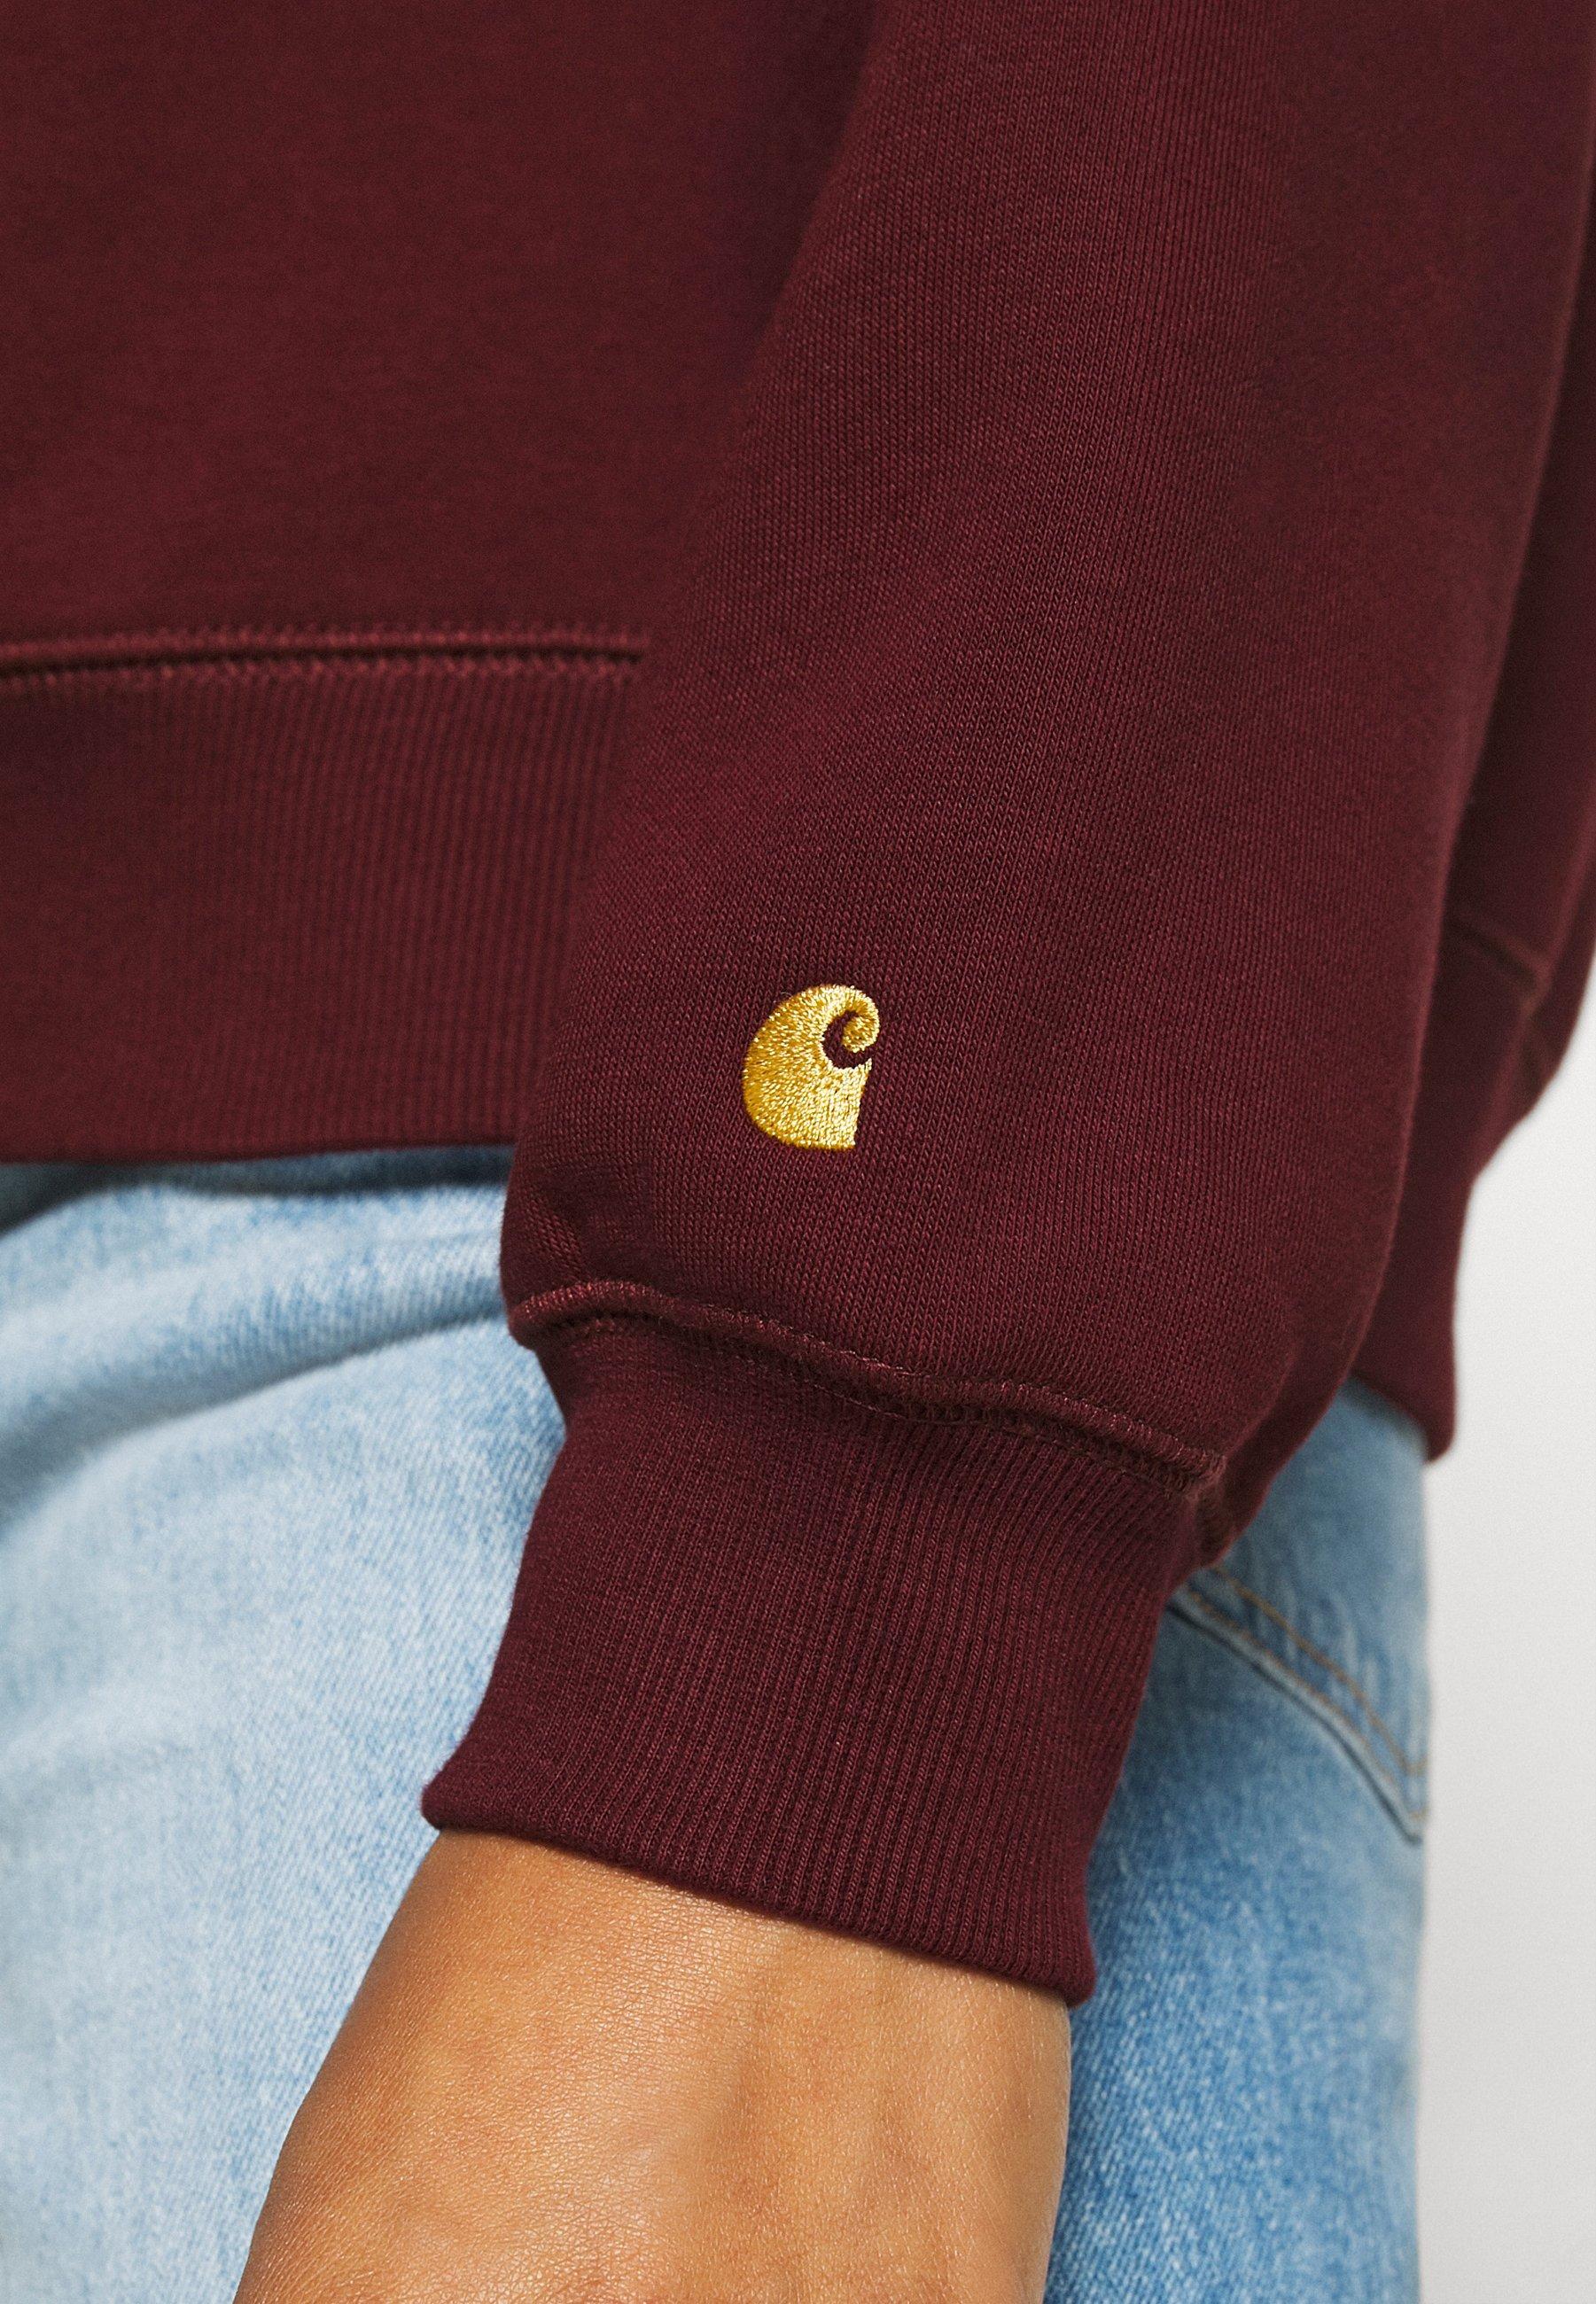 Exclusive Low Cost Women's Clothing Carhartt WIP CHASE Sweatshirt bordeaux/gold Fl0L0jG67 lO9EWKFZ9